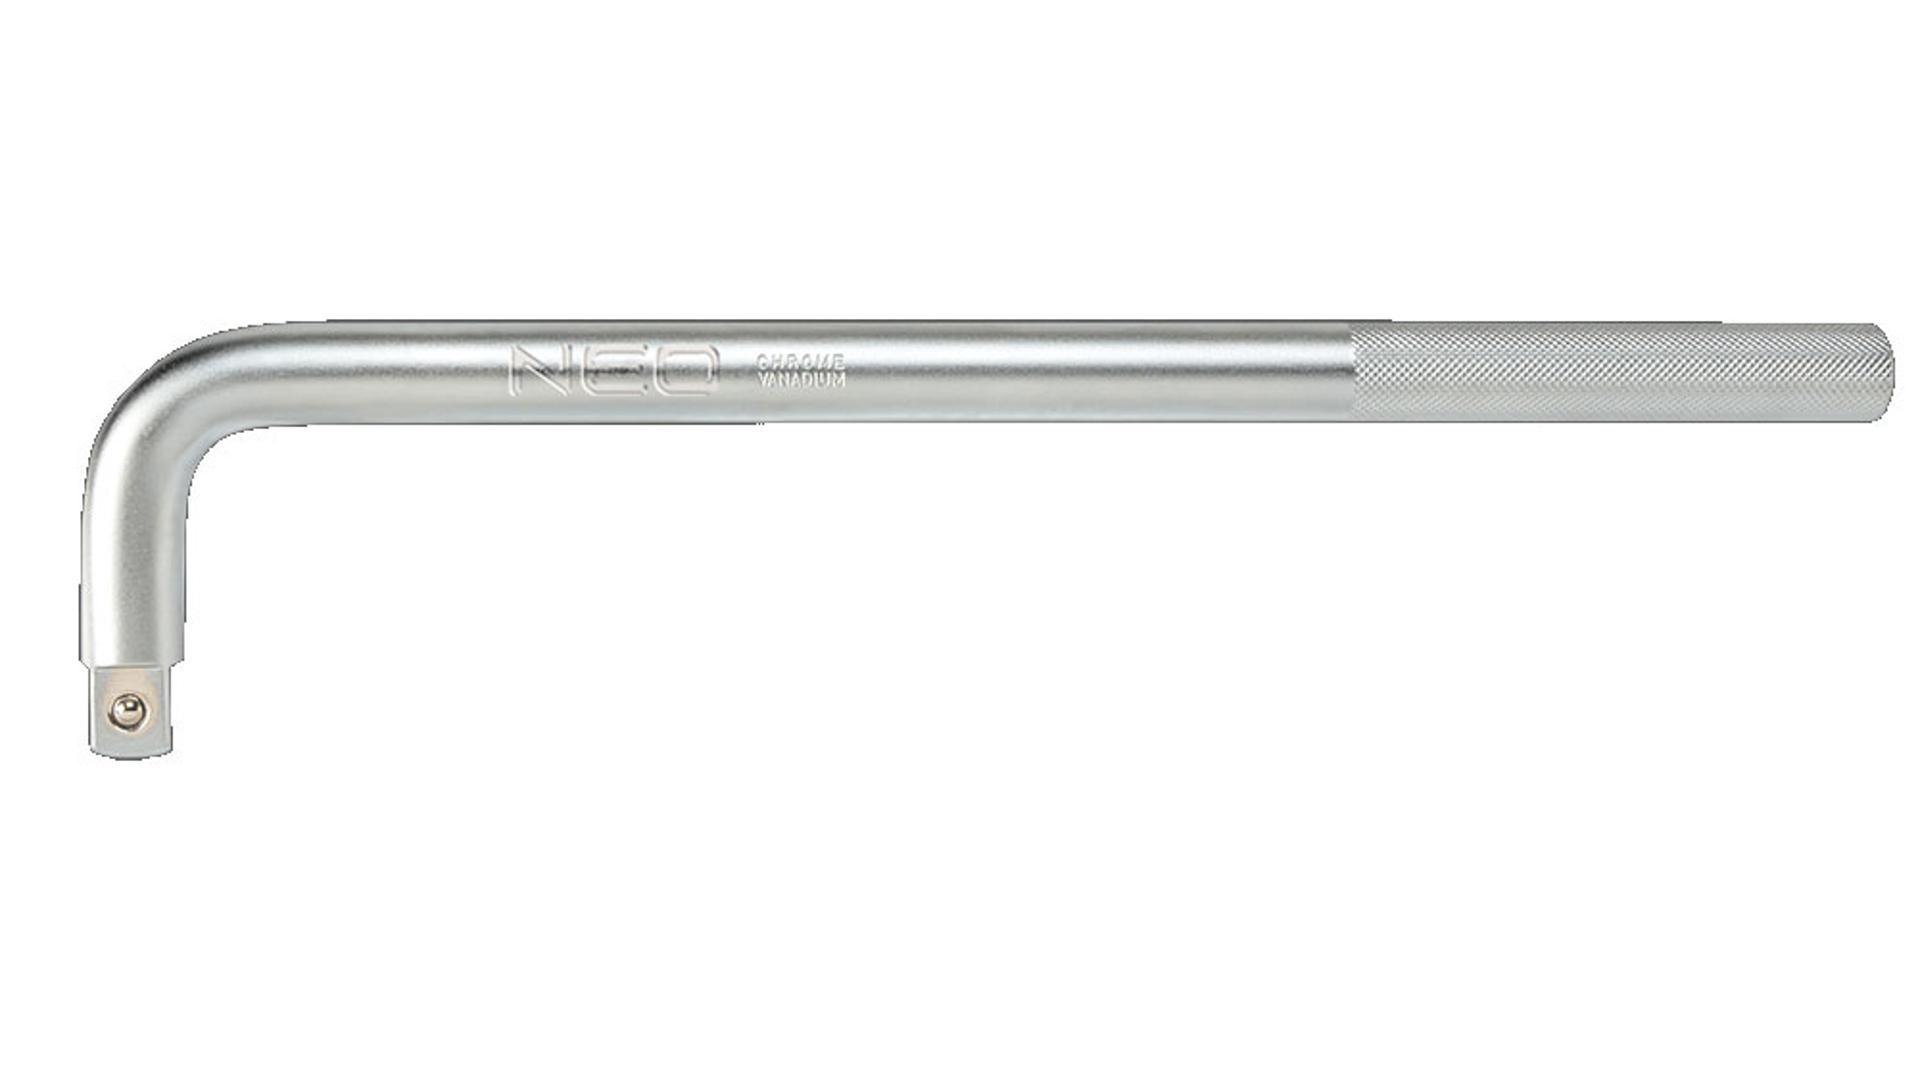 NEO Koliesko typu L 1/2, 250mm